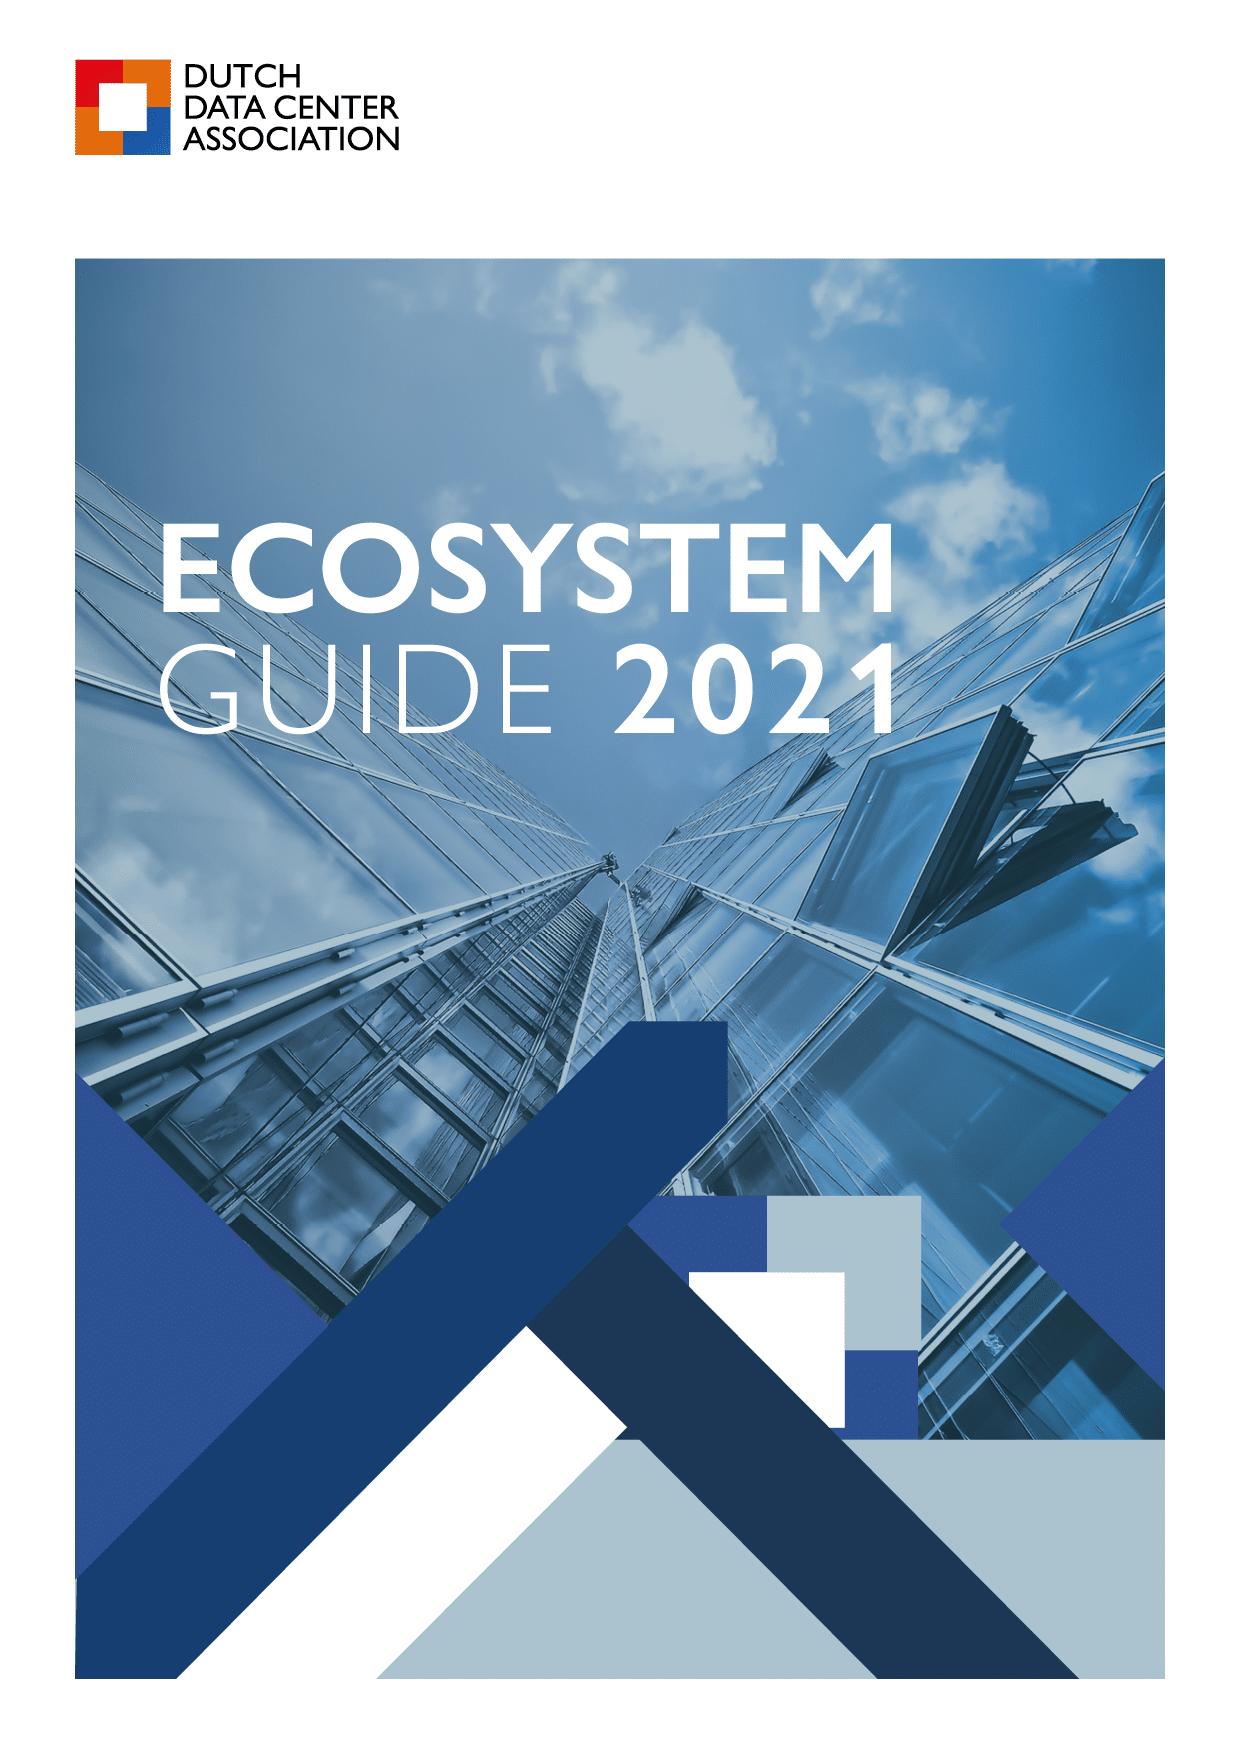 DDA Publishes Ecosystem Guide 2021